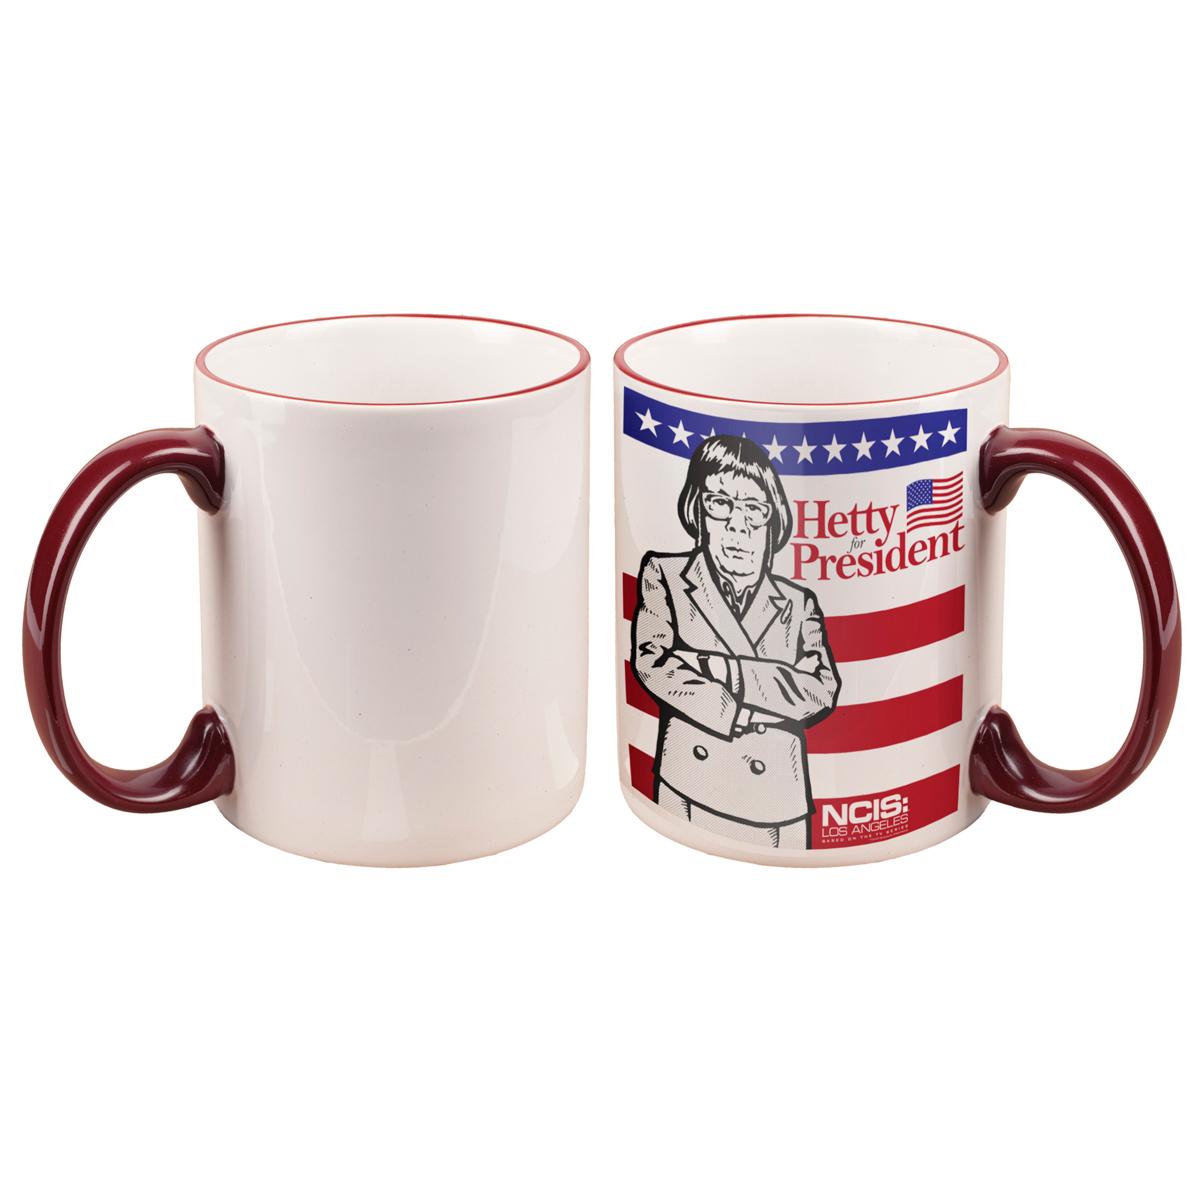 NCIS: Los Angeles Hetty For President Mug